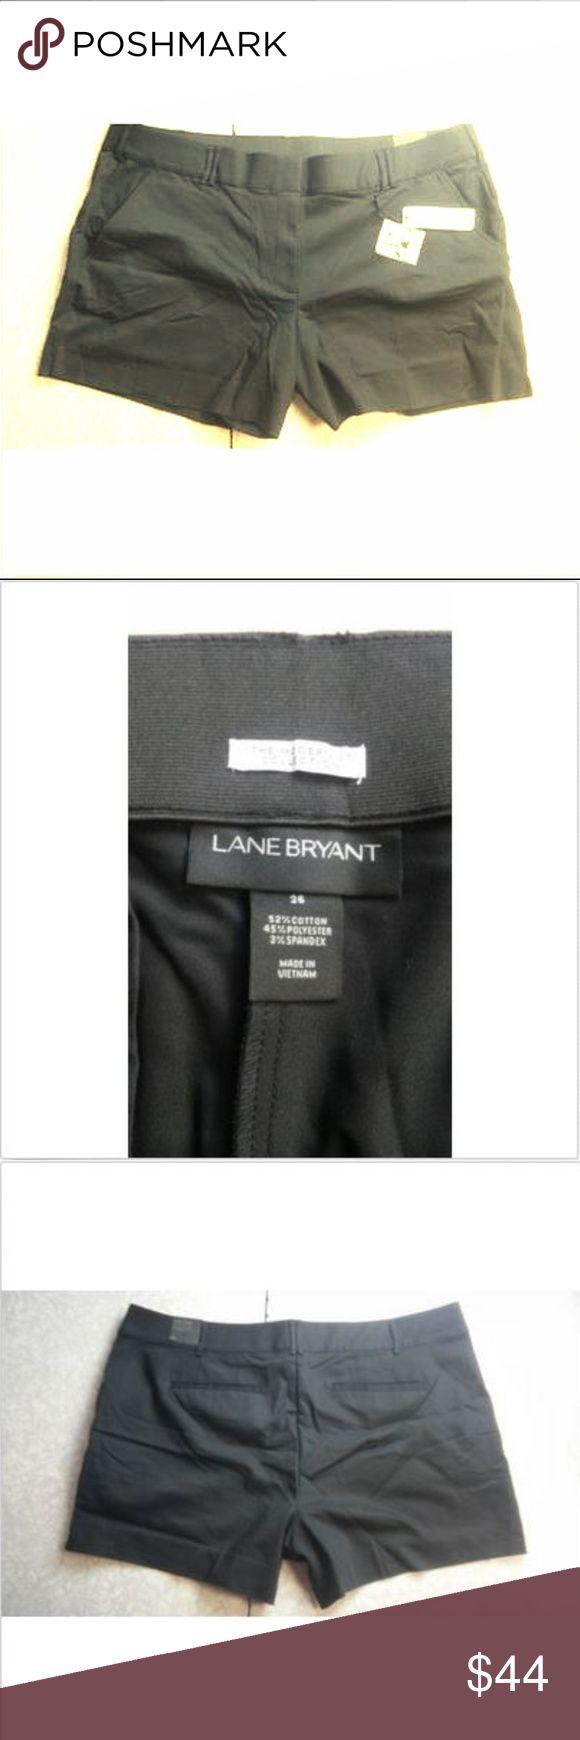 Lane Bryant ~ Black Lena Shorts Women's Size 26 Lane Bryant ~ Black Lena Shorts ...